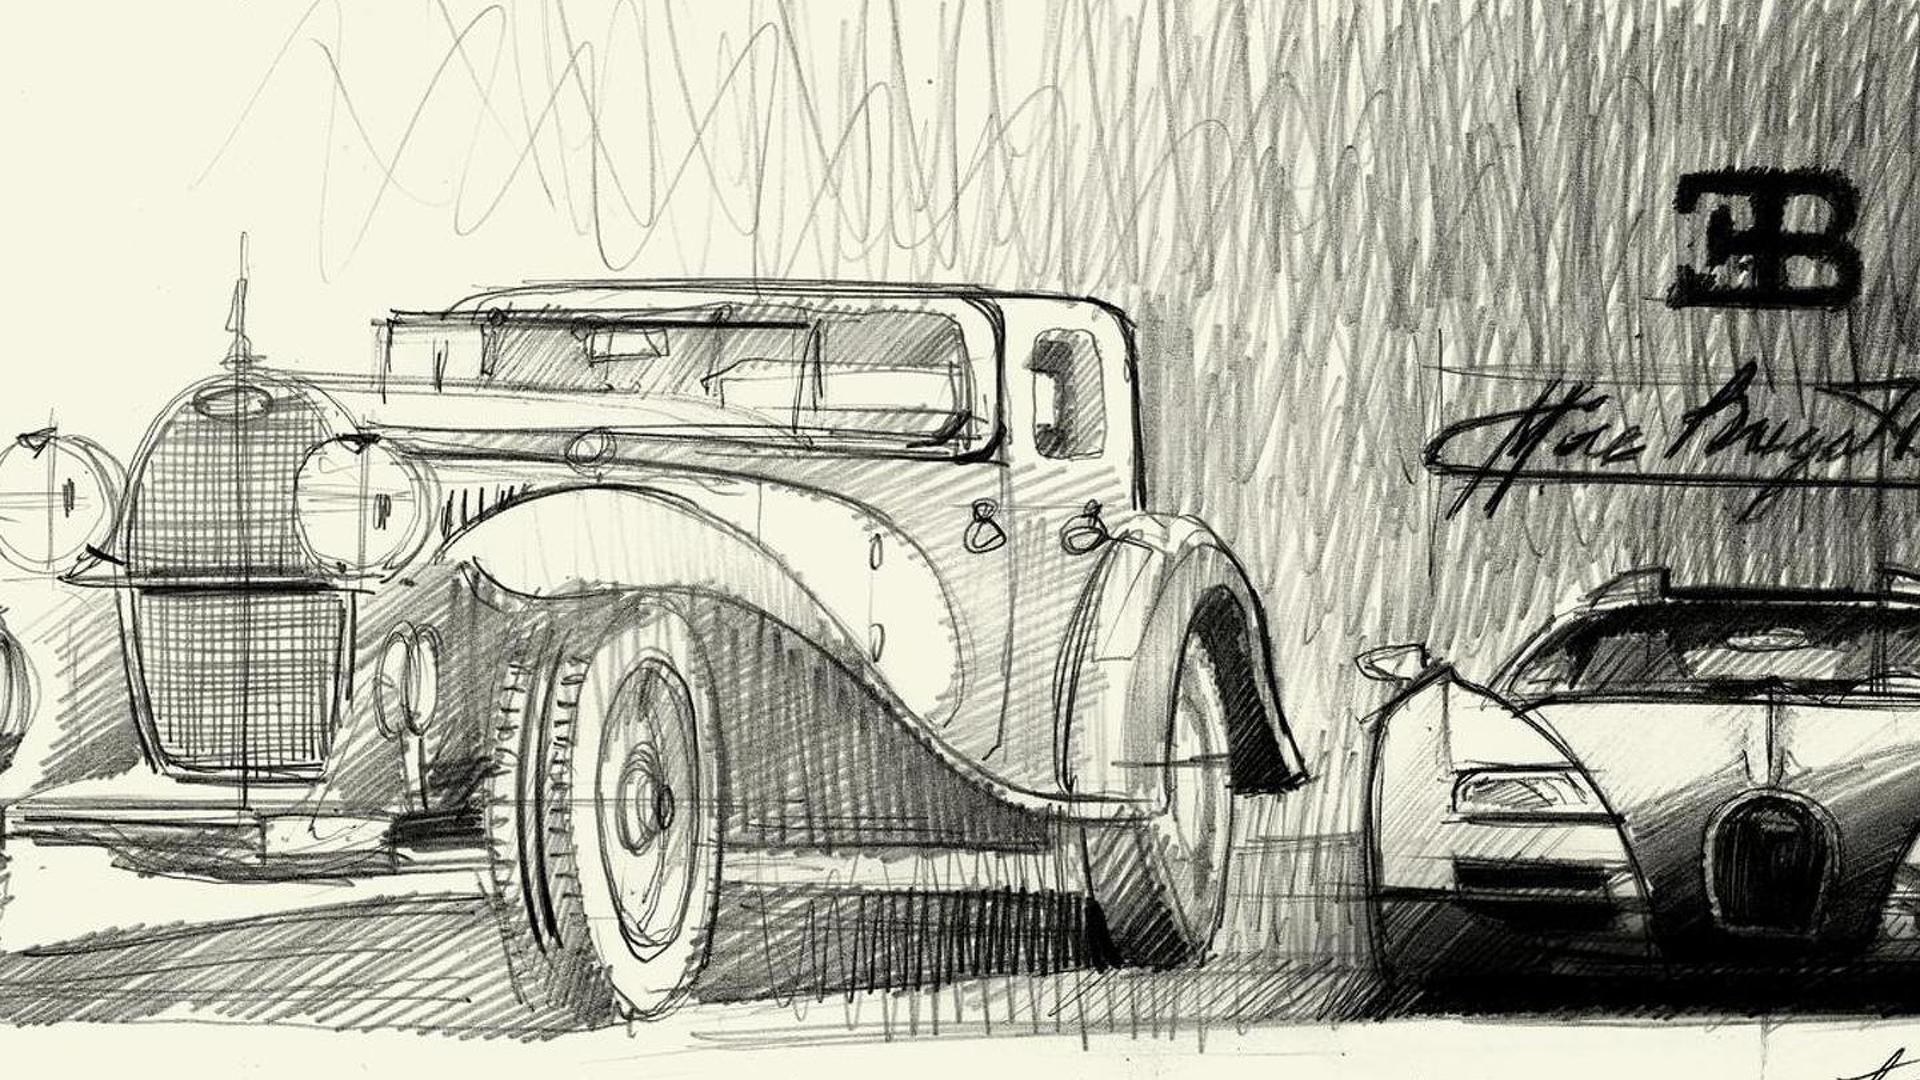 Рисунок Bugatti Veyron Ettore Bugatti Edition и Type 41 Royale